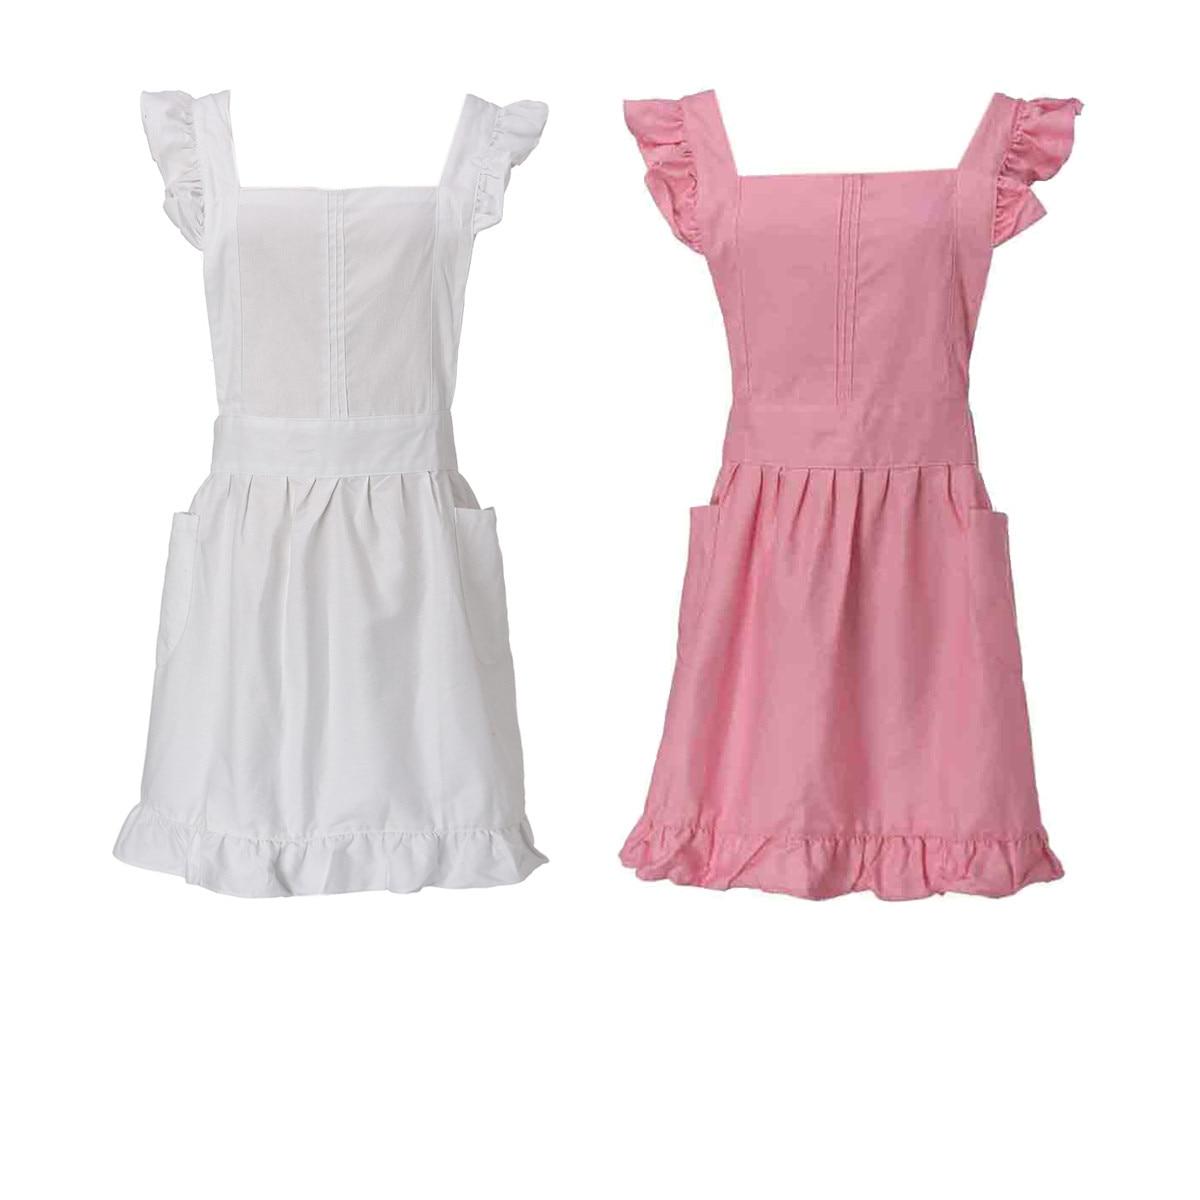 White pinafore apron costume - White Victorian Lace Bib Apron Pinafore Maid Cinderella Alice Mrs Santa Princess Rural Style Cotton Grid